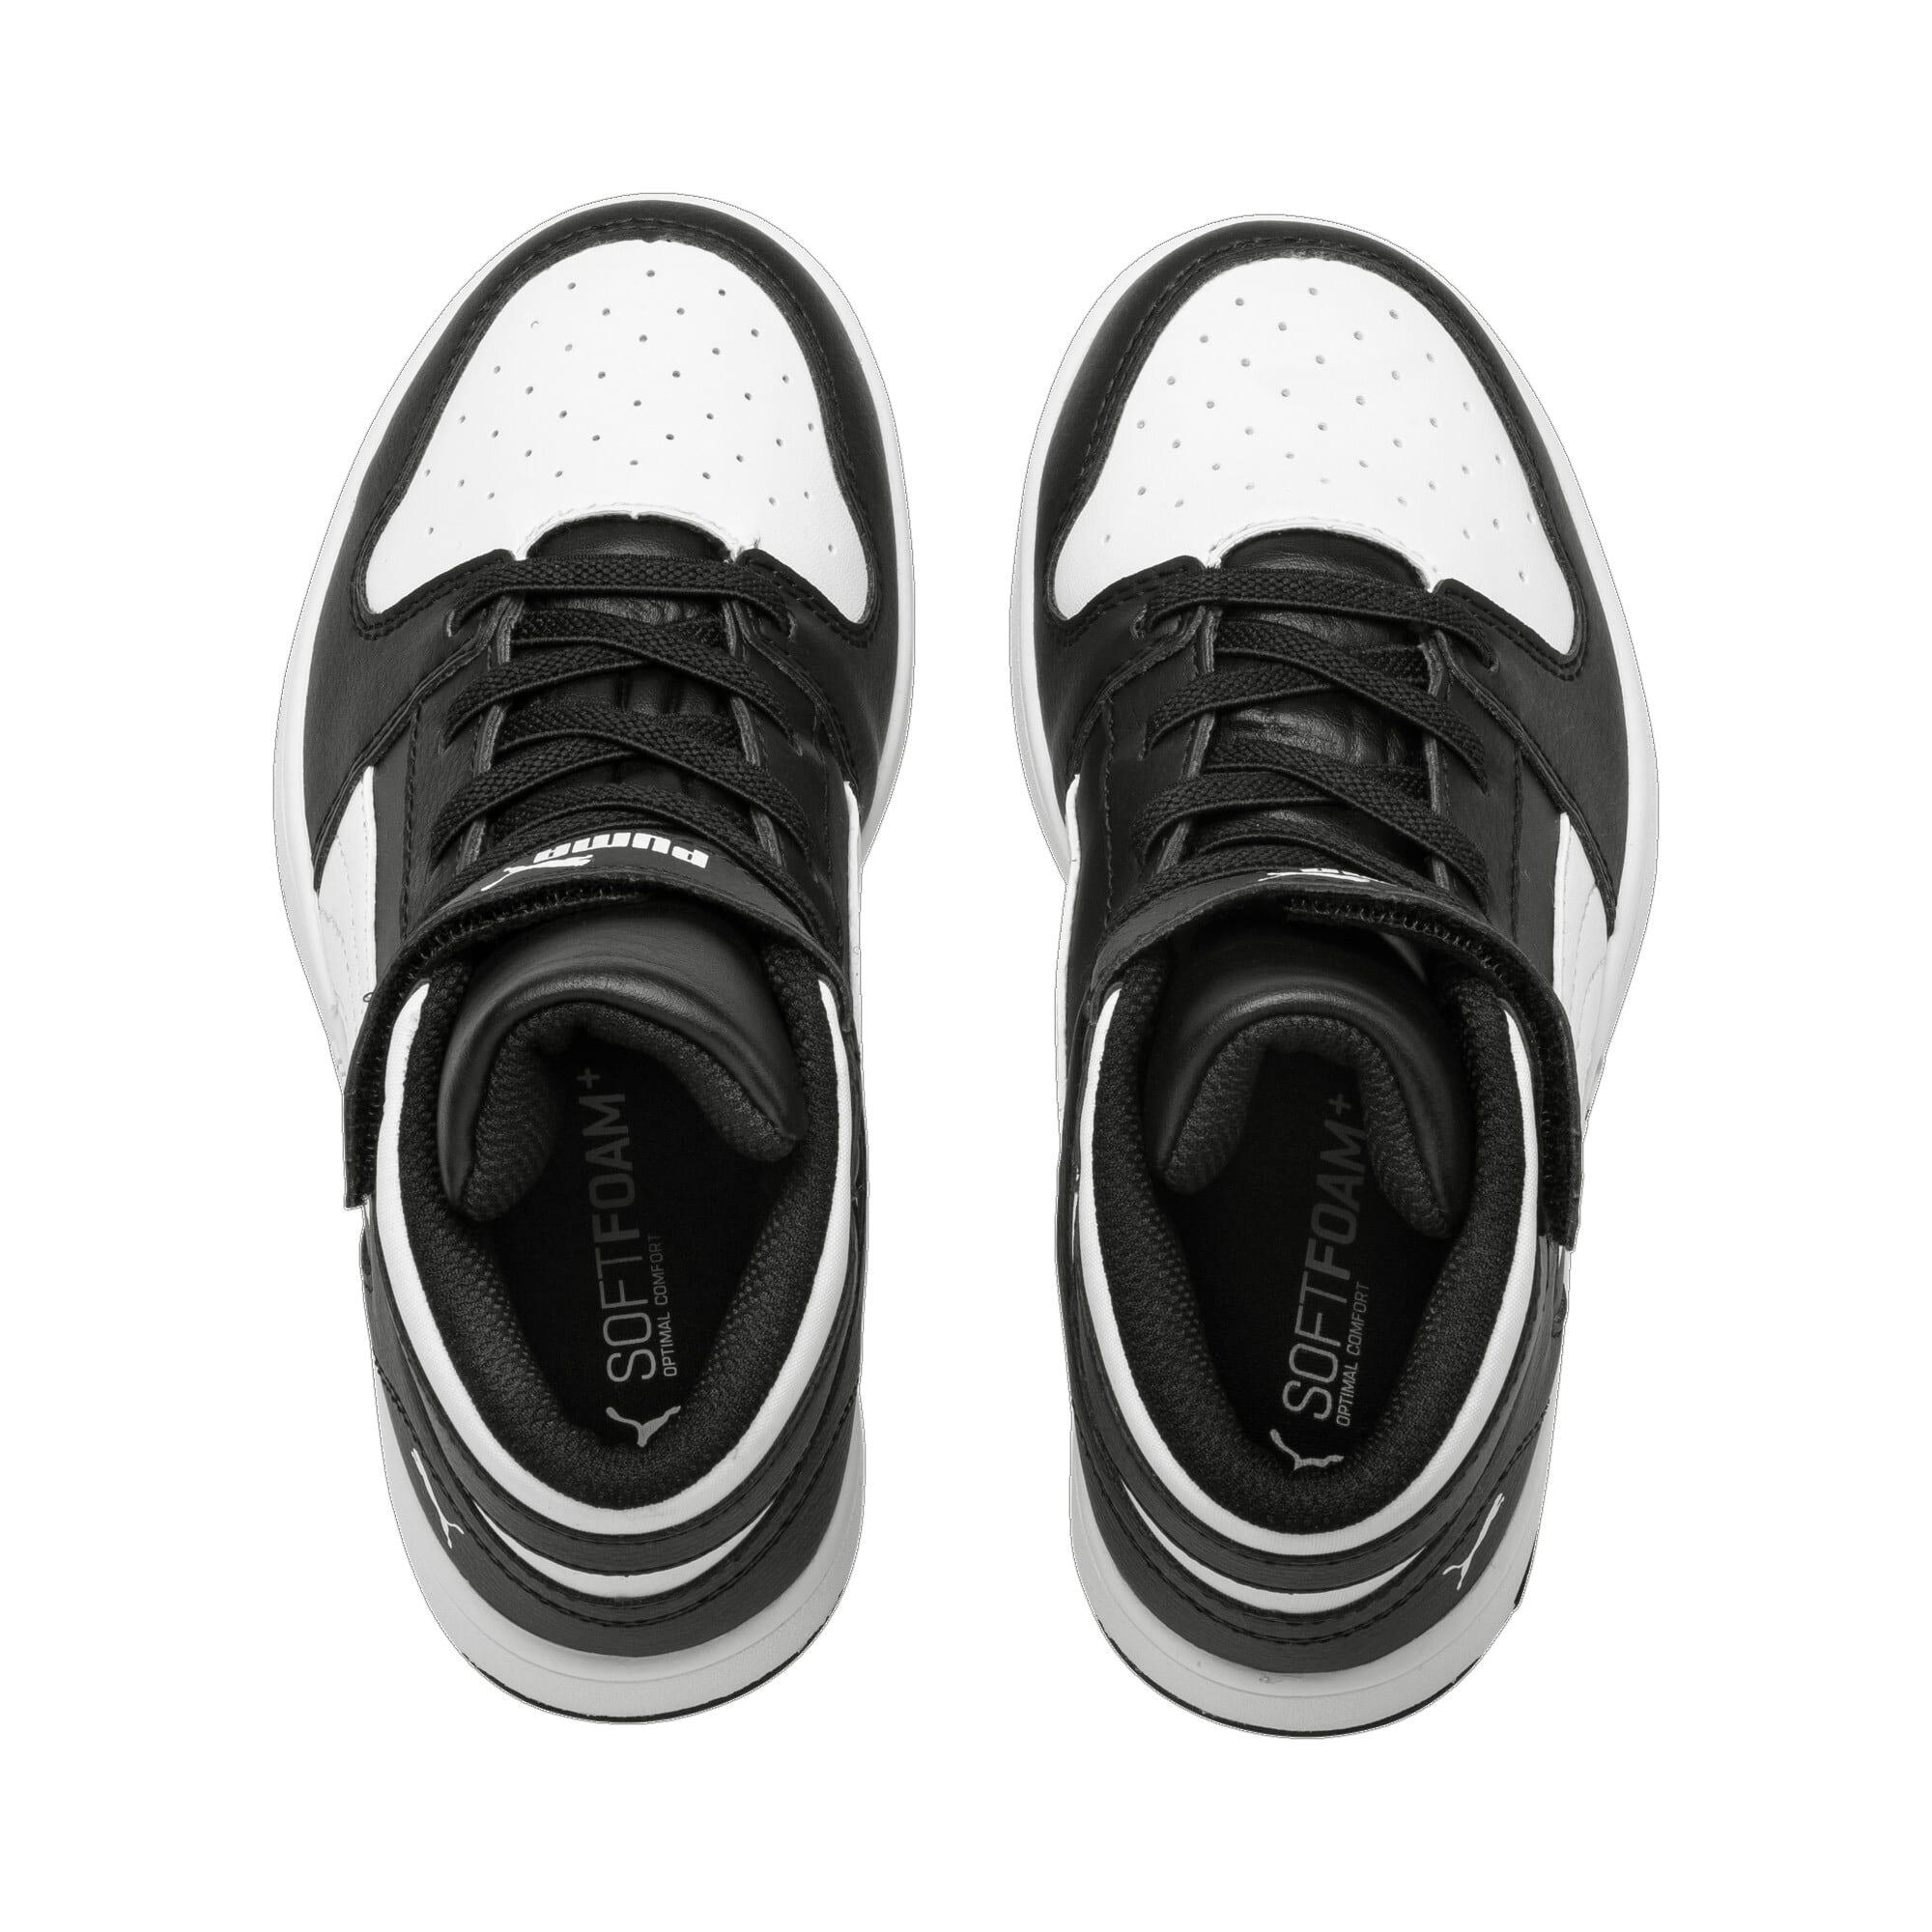 Thumbnail 6 of PUMA Rebound LayUp Little Kids' Shoes, Puma Black-Puma White, medium